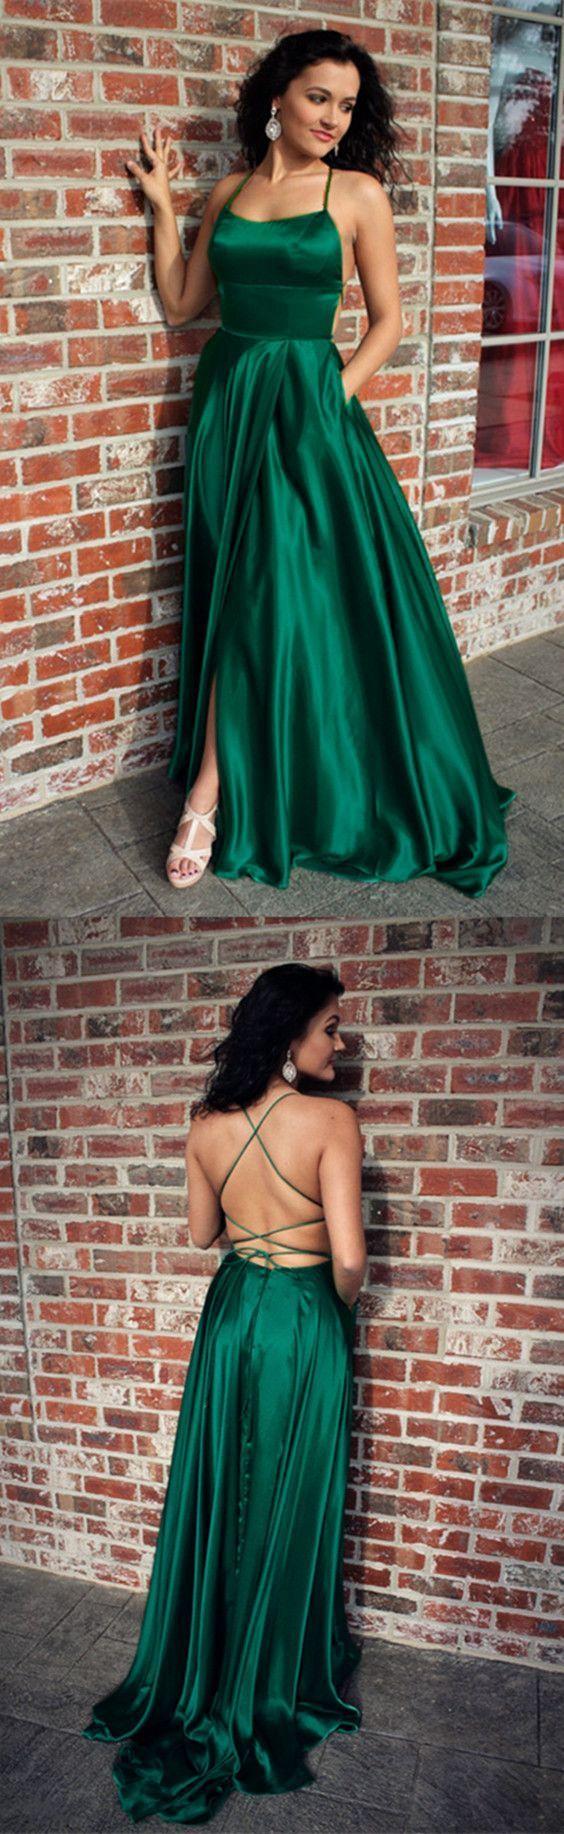 Emerald green prom dress  Dark Green Bridesmaid DressesLong Prom DressesEmerald Green Prom